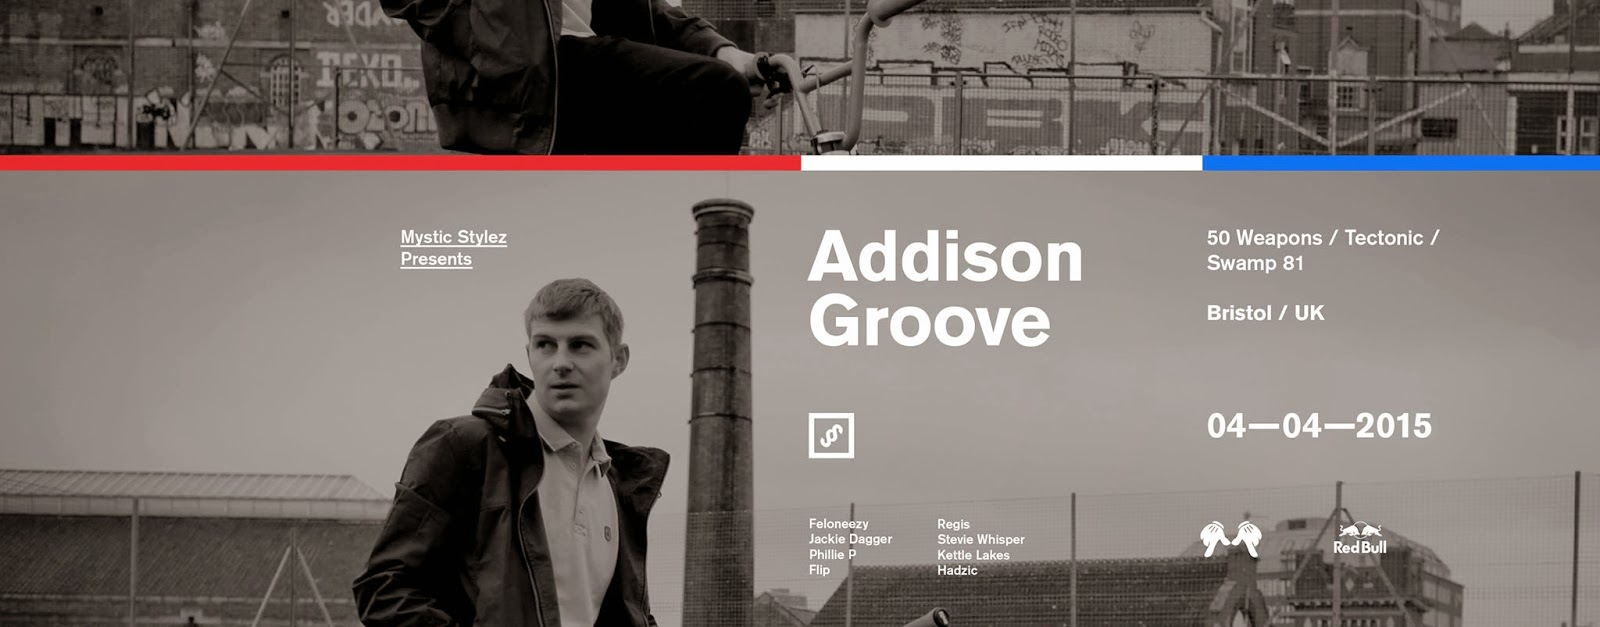 """Addison Groove"" u Drugstore-u"